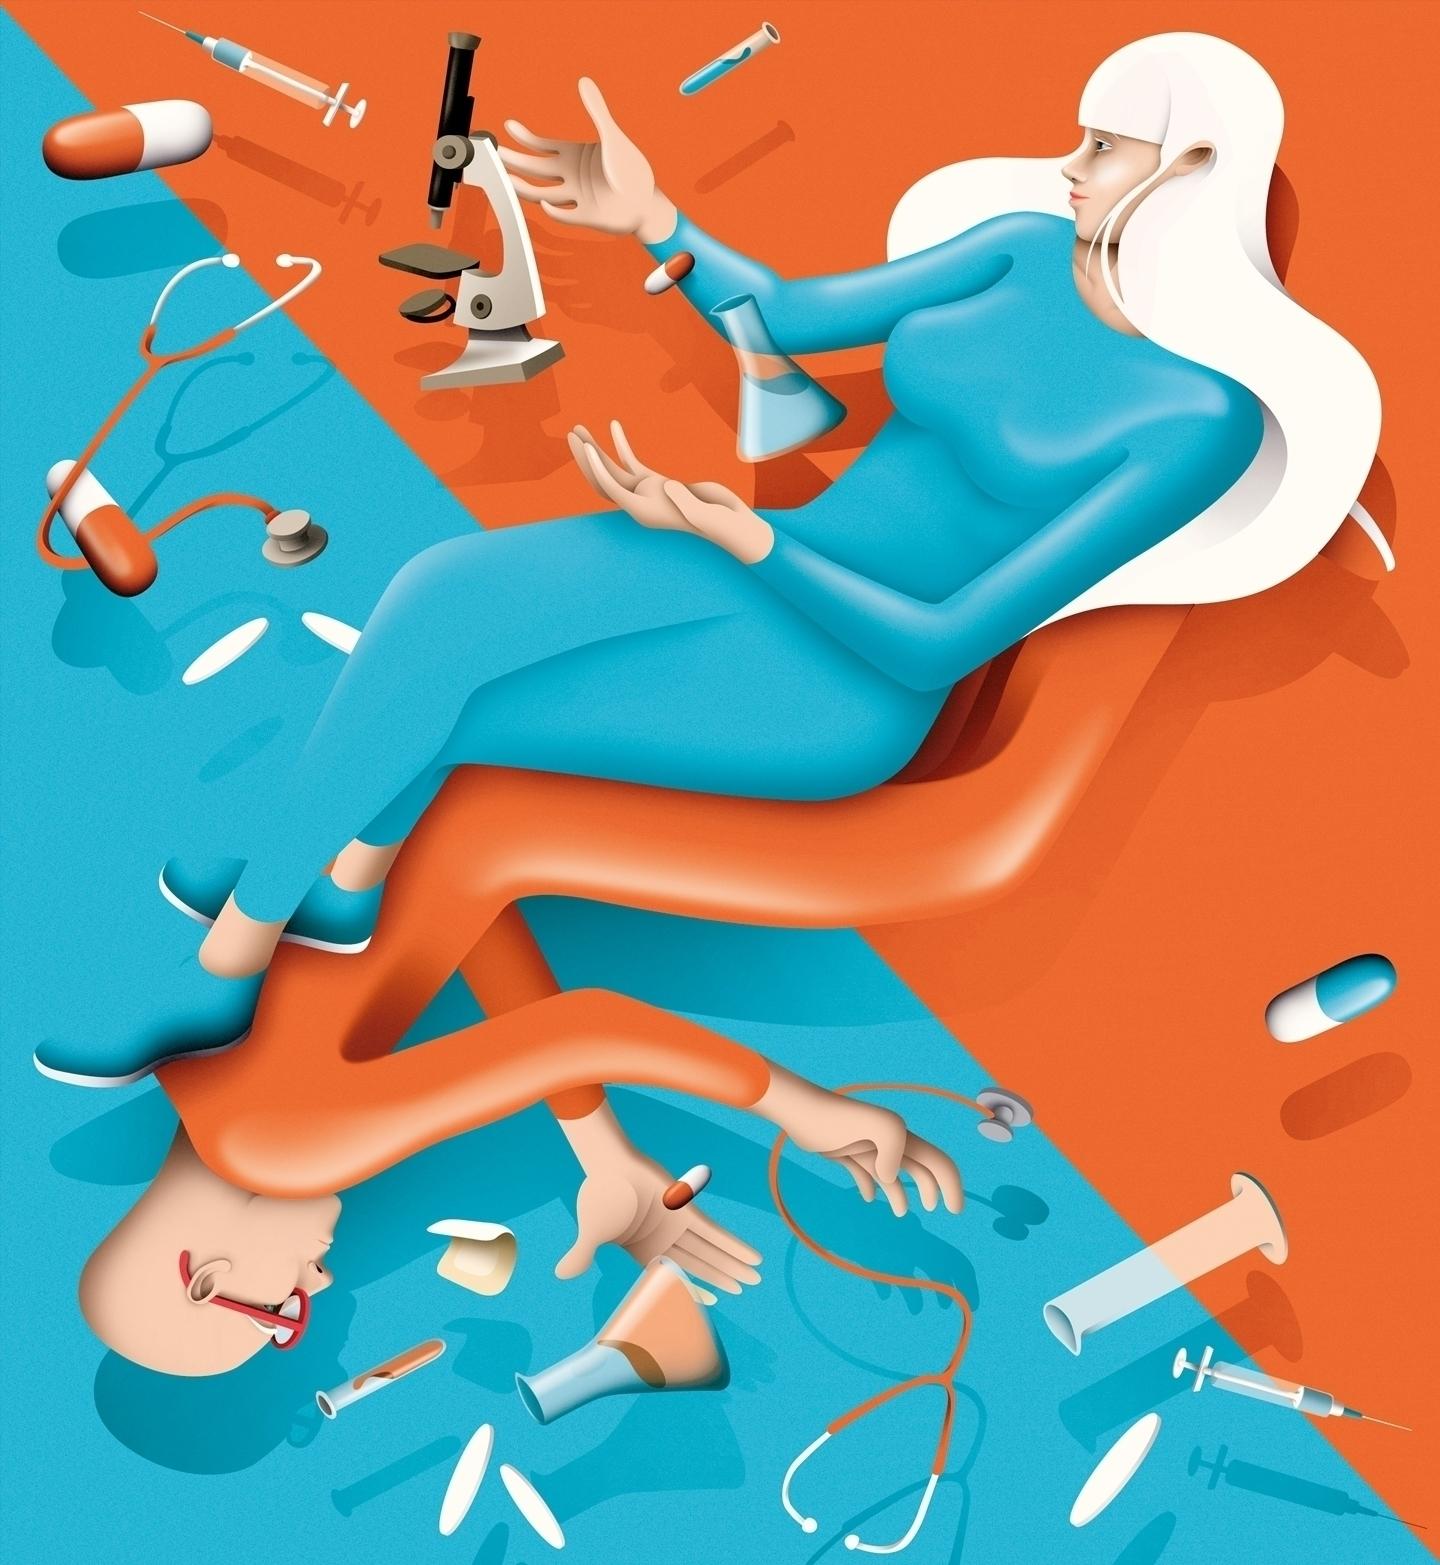 INSERM Science Health Magazine  - iamdaq   ello